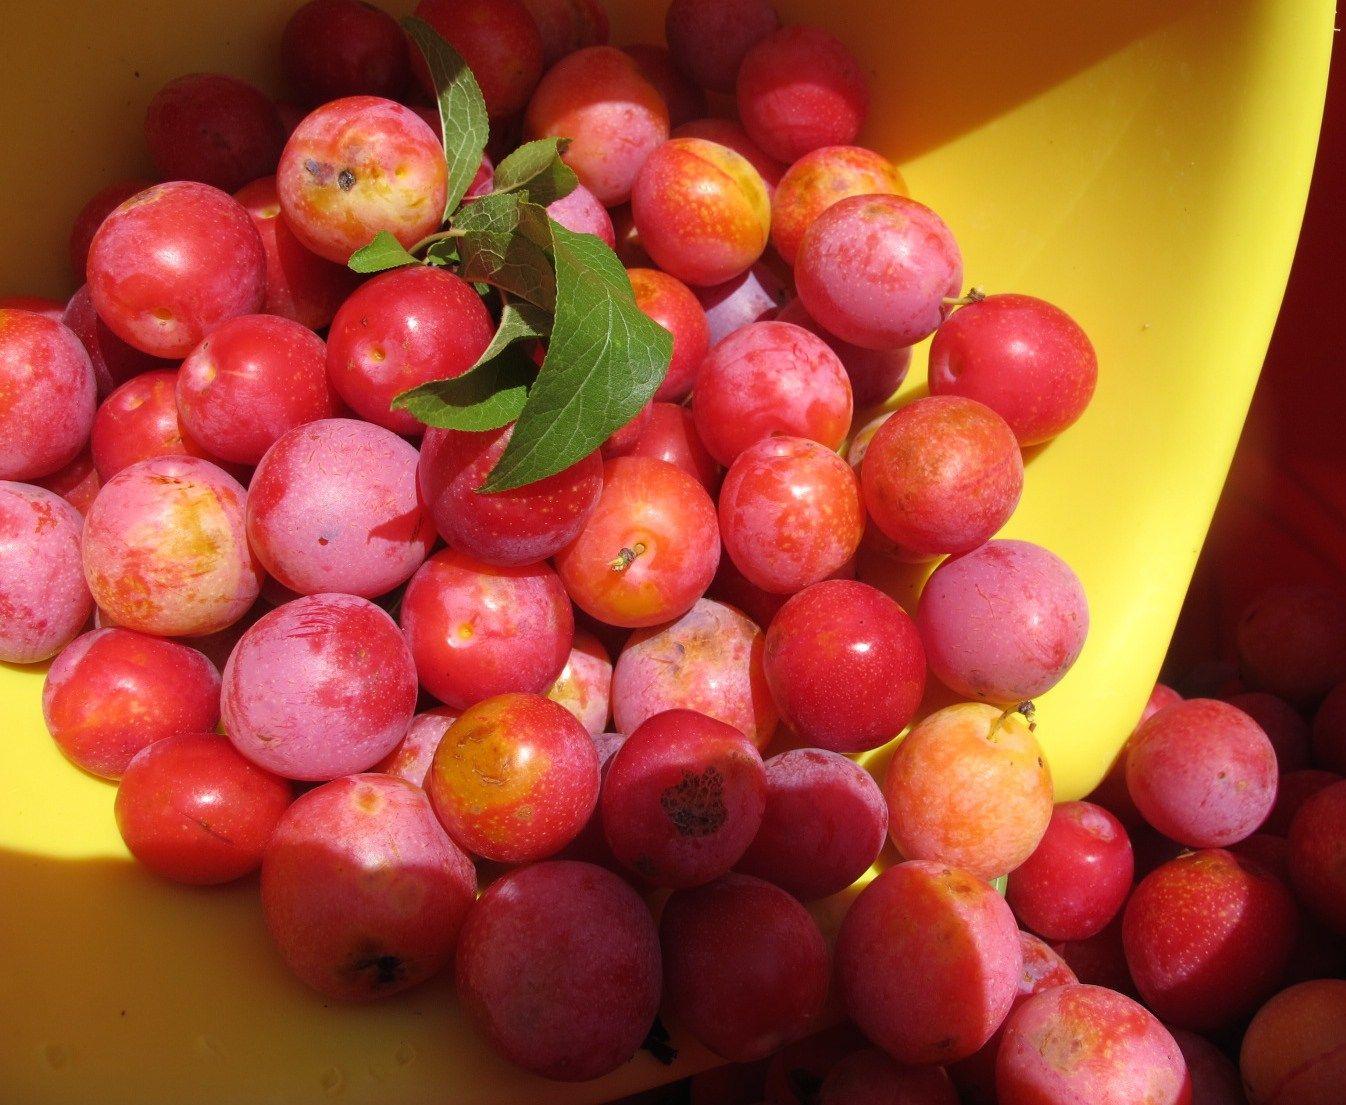 Making Wild Plum Jelly An Ekstrom Tradition Plum Jelly Recipes Plum Jelly Wild Plum Jelly Recipe